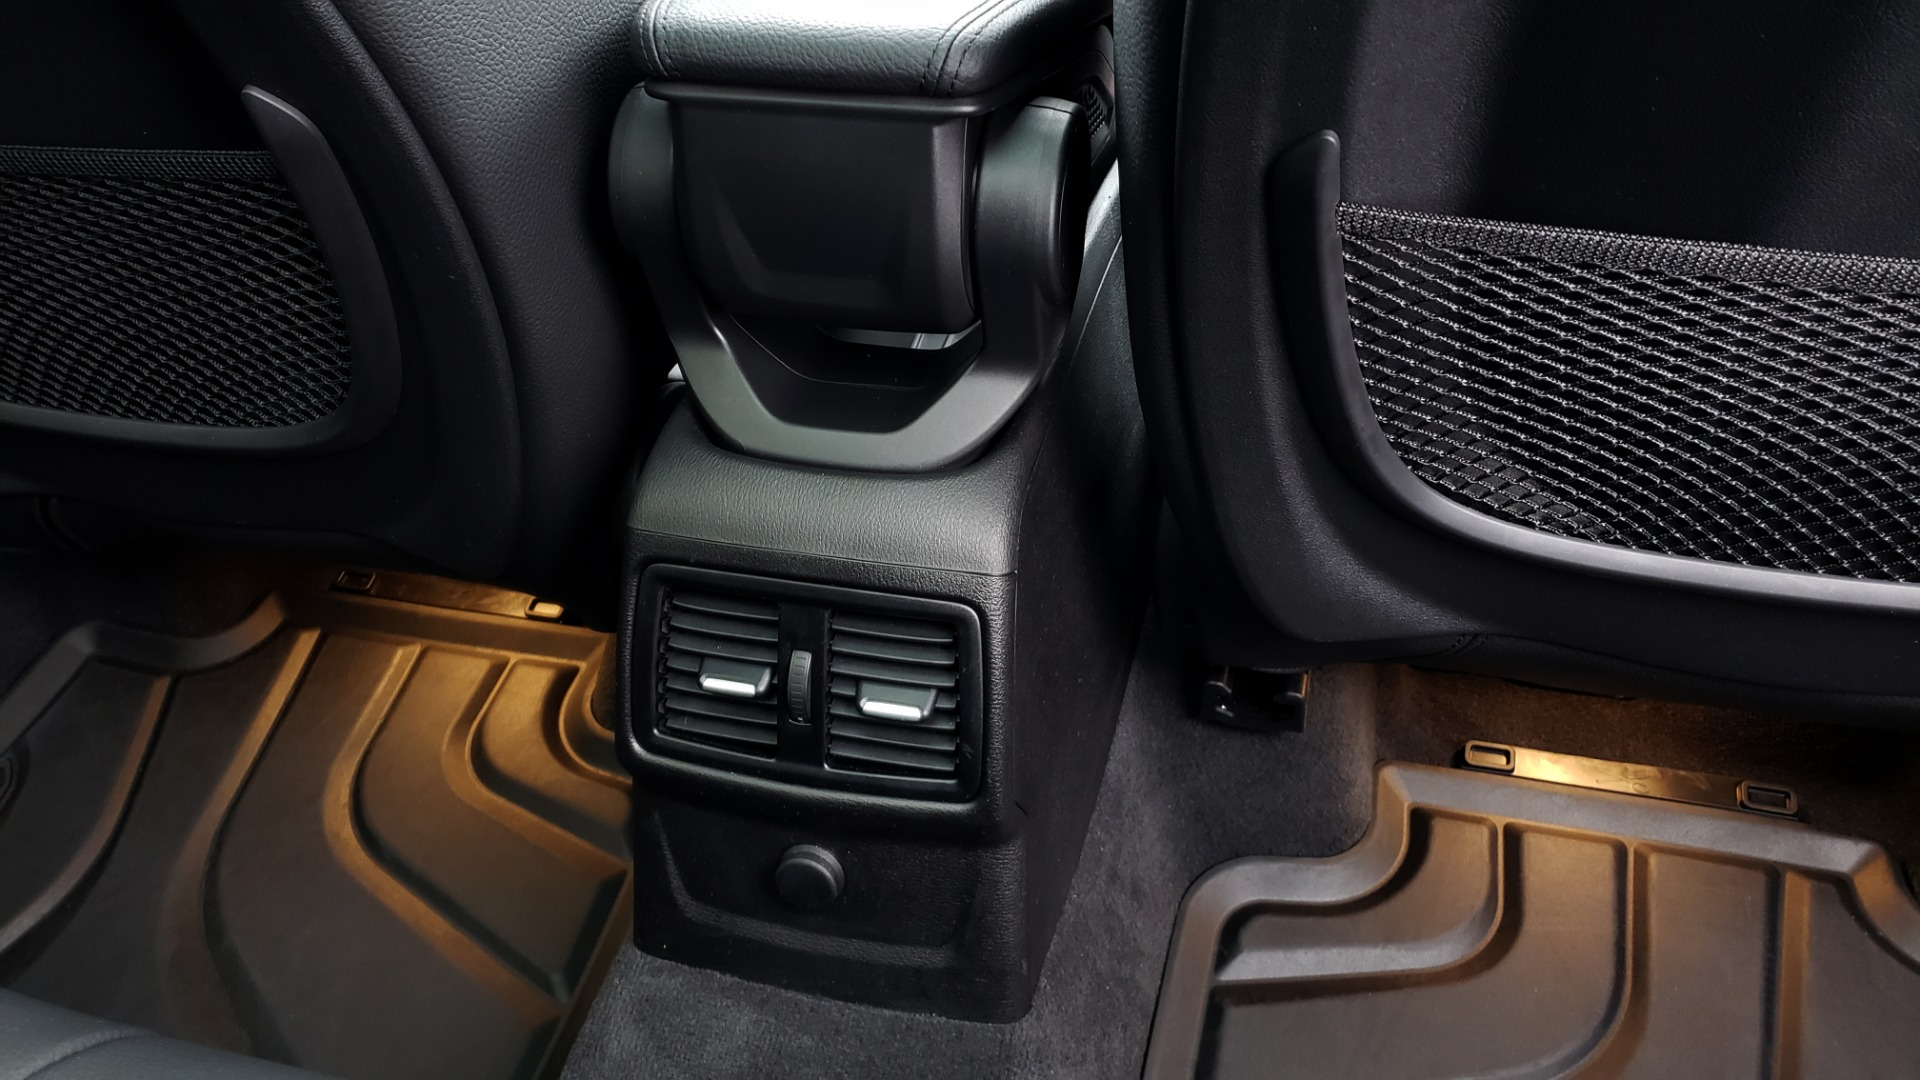 Used 2017 BMW X1 XDRIVE28I / PREM PKG / DRIVER ASST / NAV / CLD WTHR for sale Sold at Formula Imports in Charlotte NC 28227 80